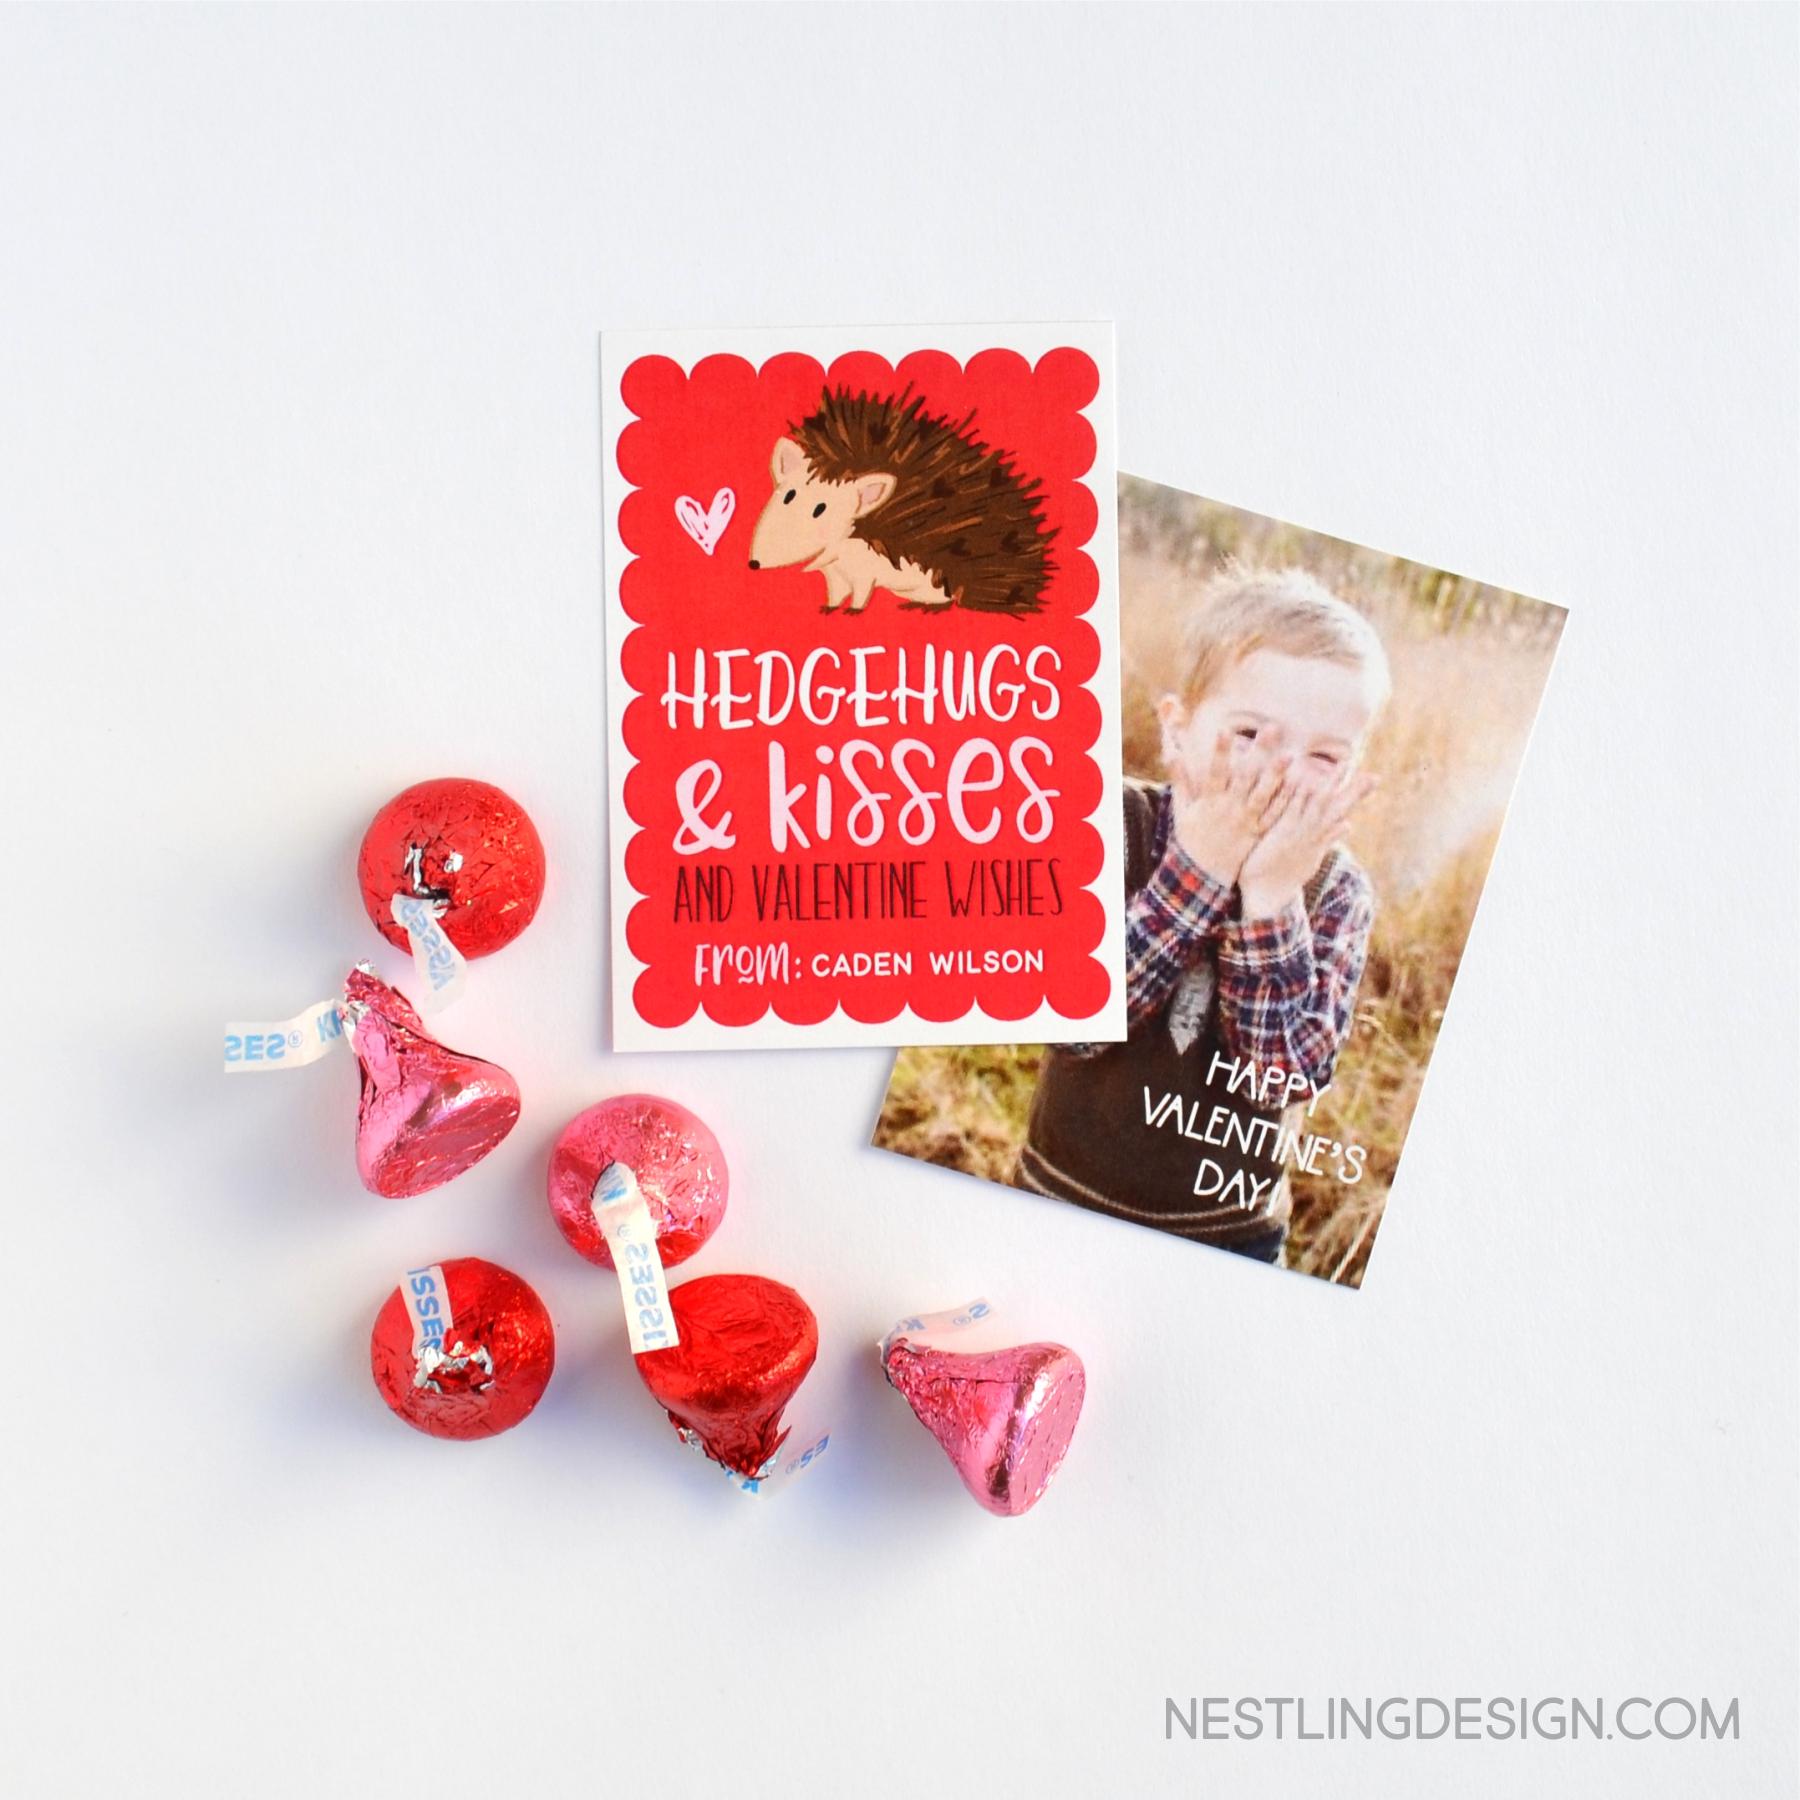 Adorable valentines for children | NestlingDesign.com